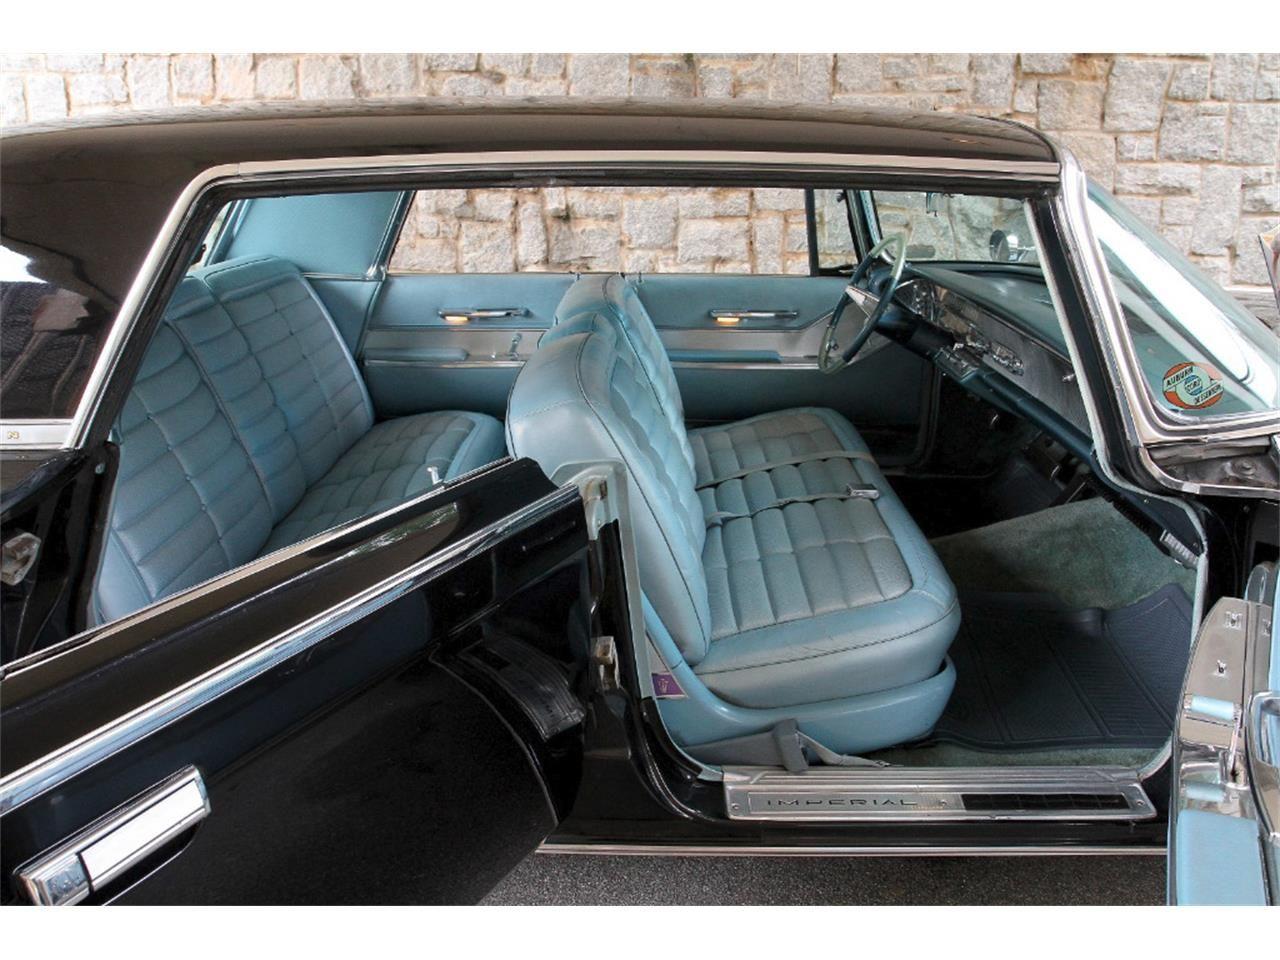 1964 Imperial Crown In Black With Med Blue Interior A True Survivor